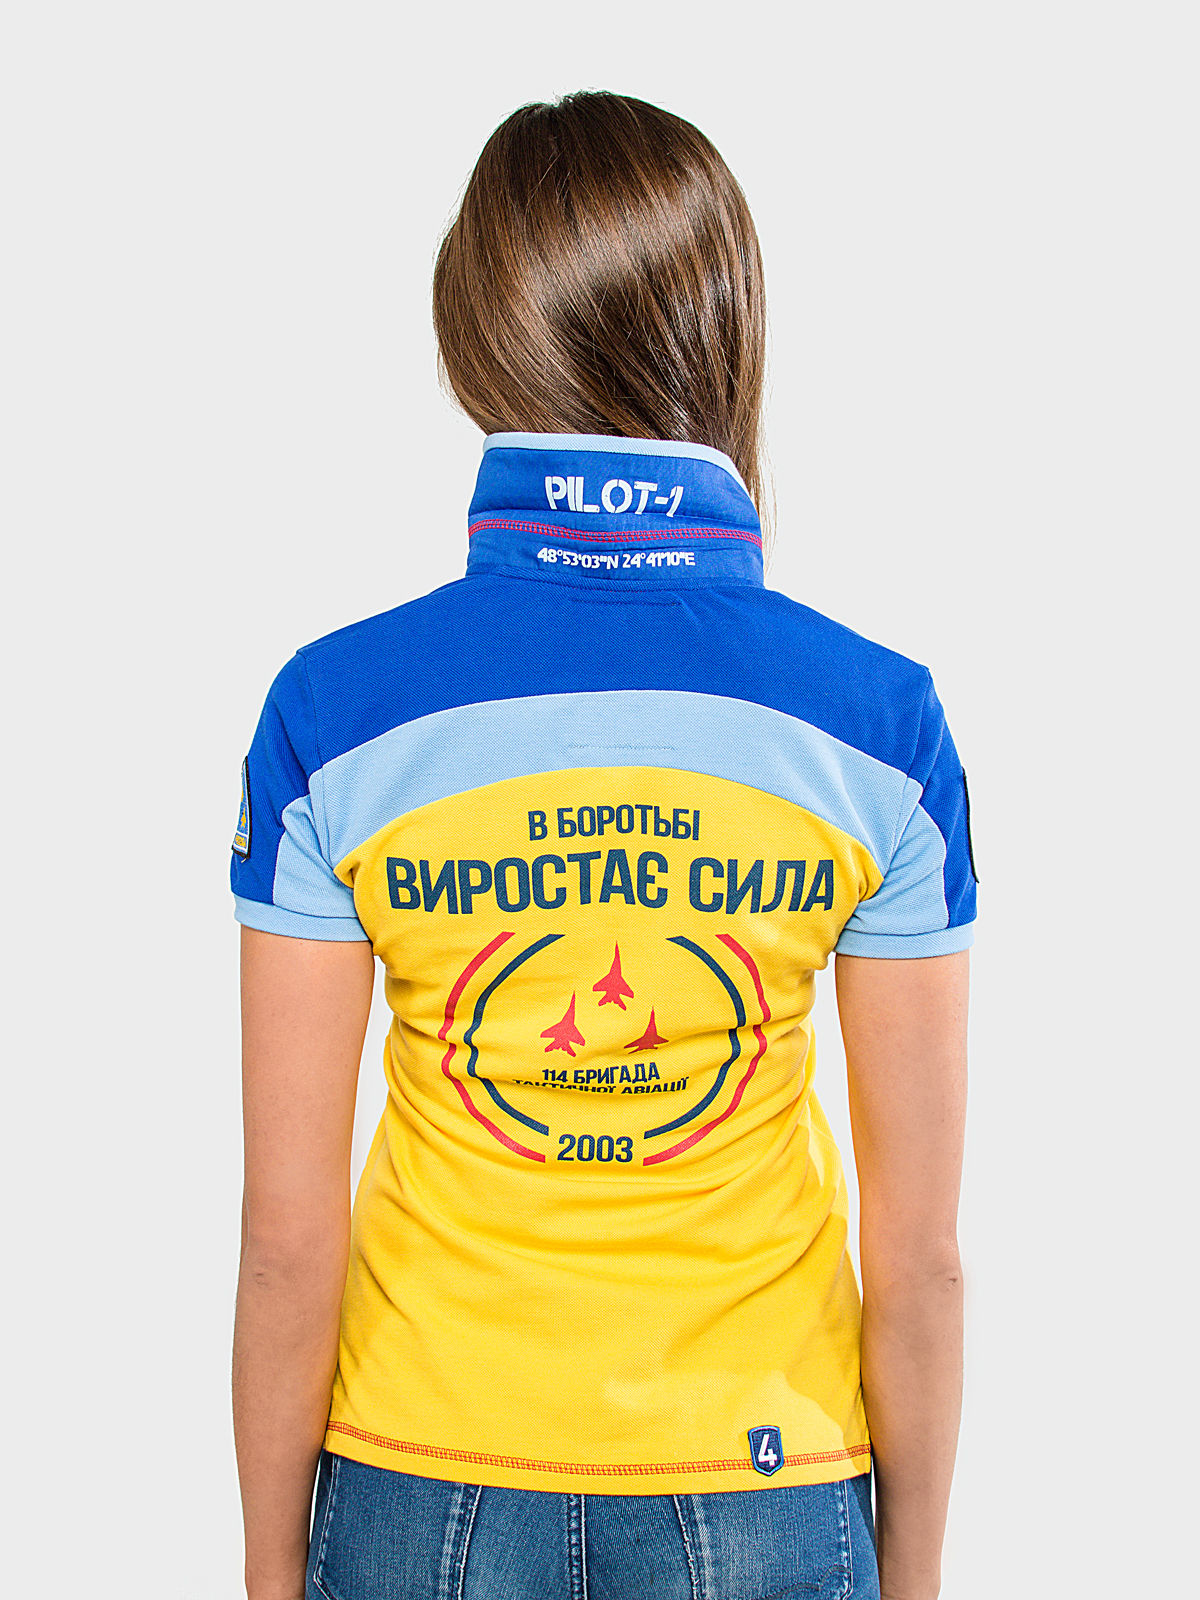 Women's Polo Shirt 114 Brigade (Ivano-Frankivsk). Color yellow.  Технологія нанесення зображень: вишивка, шовкодрук, шеврони.